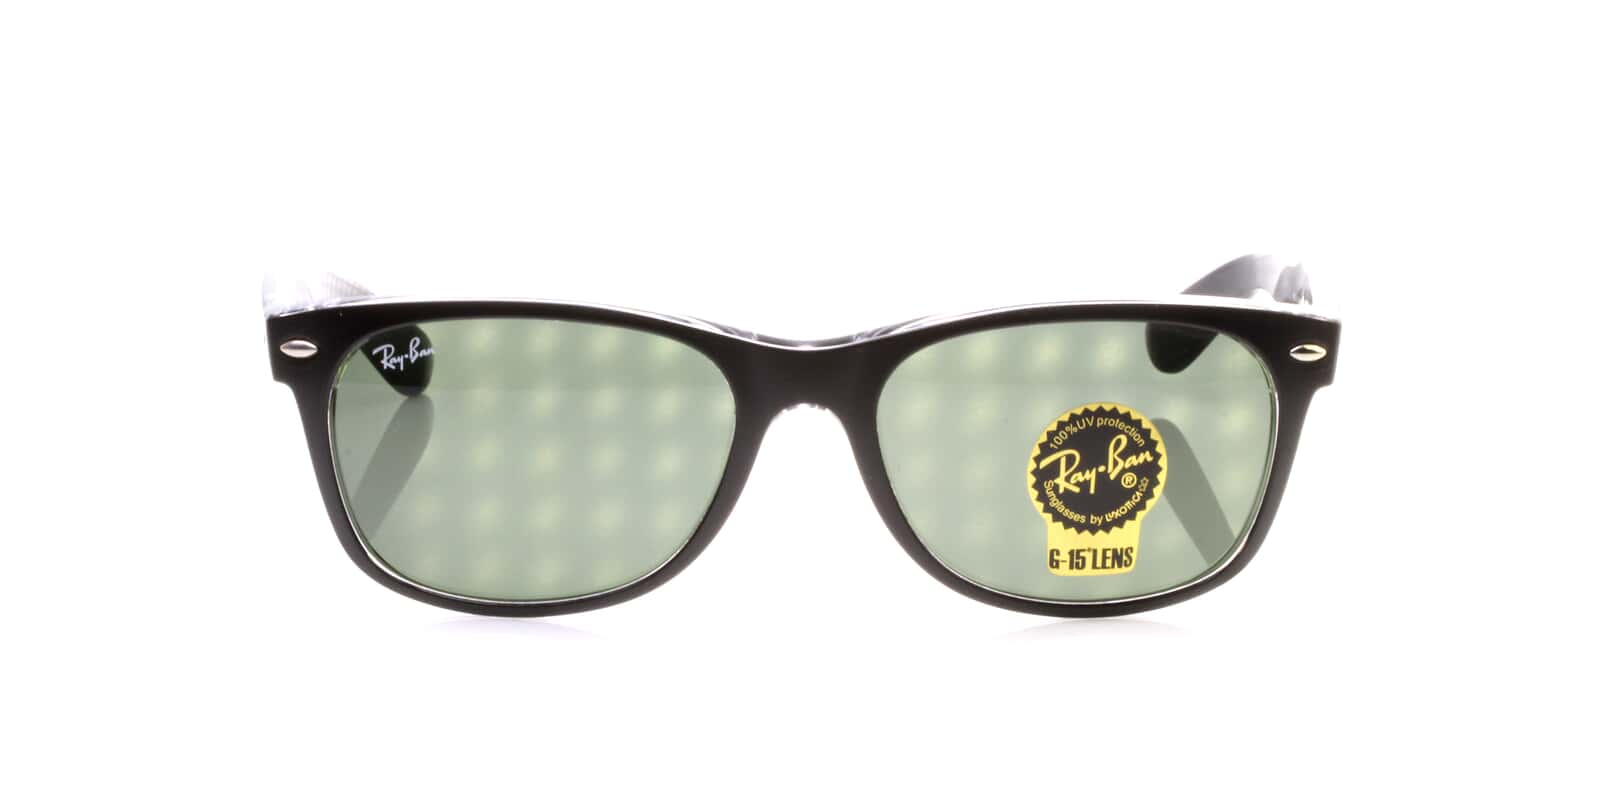 bbd644327c7 Buy Ray Ban RB2132 6052 (55-18-145) Sunglasses